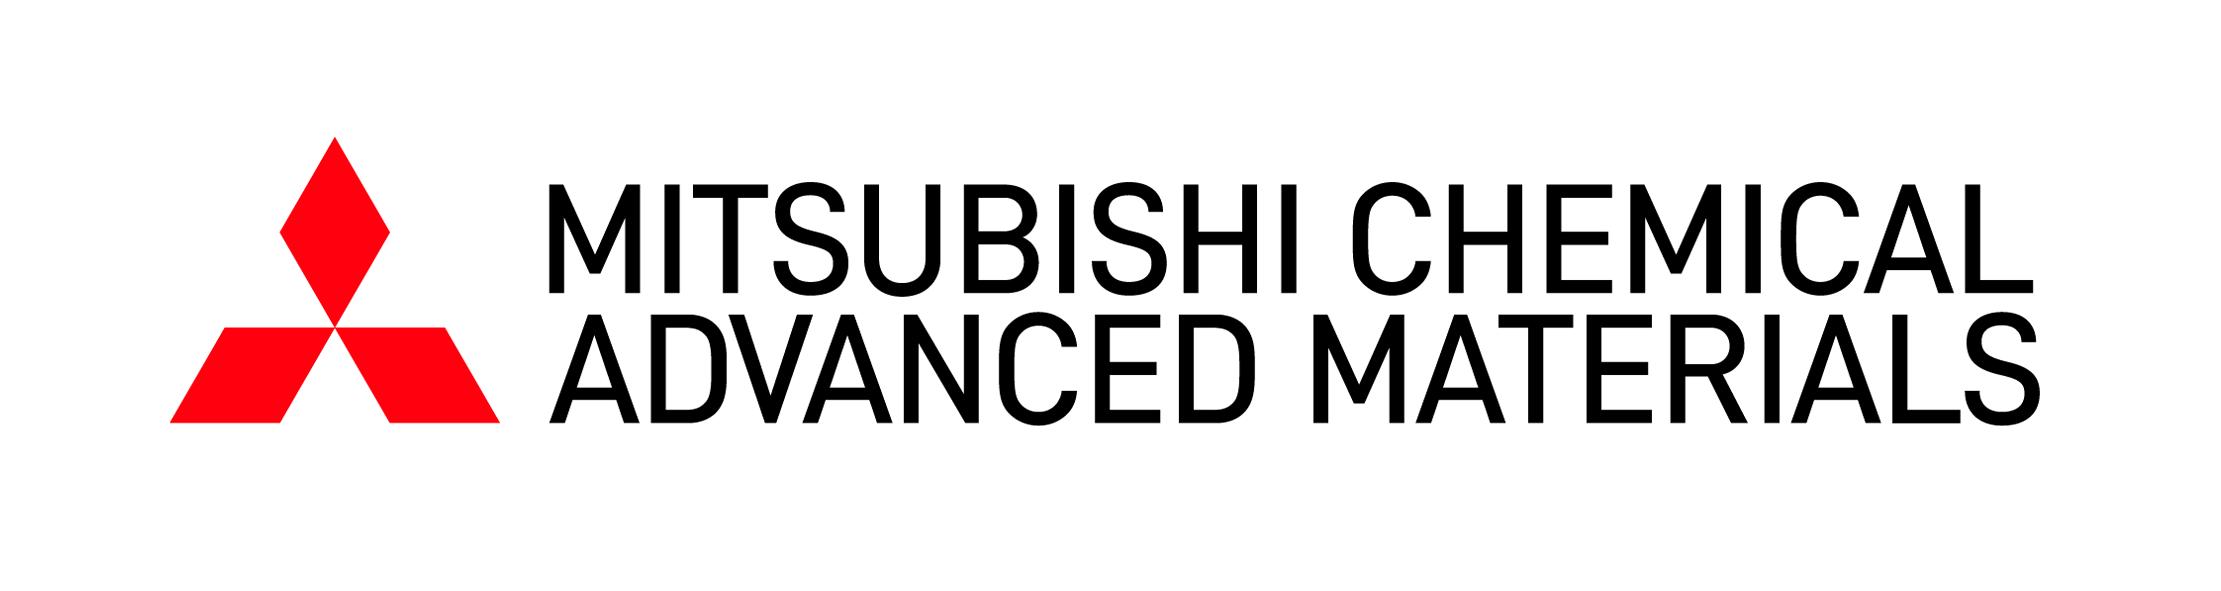 Mitsubishi Chemical Advanced Materials UK